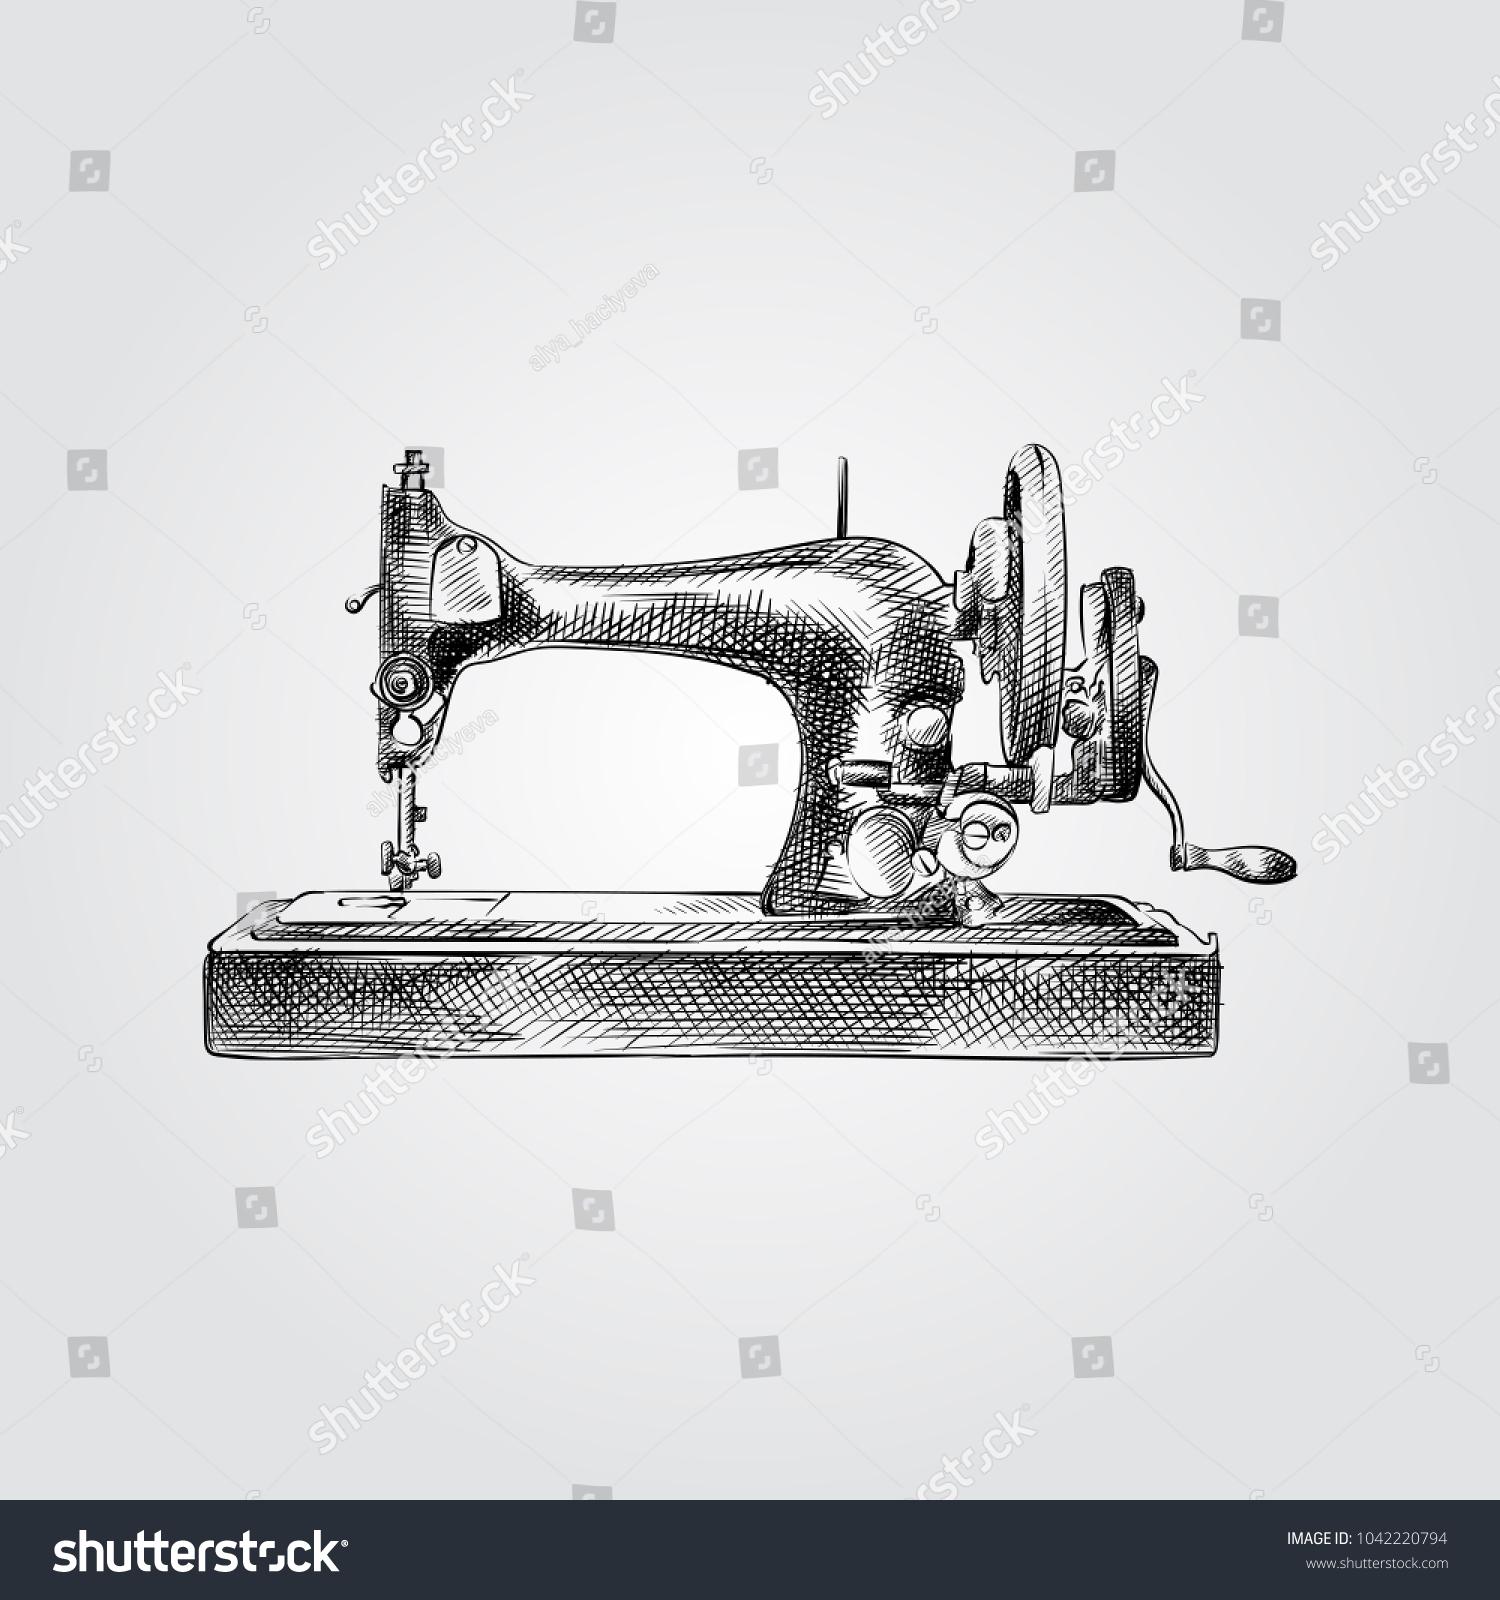 Hand Drawn Sewing Machine Sketch Symbol Stock Vector (Royalty Free ...